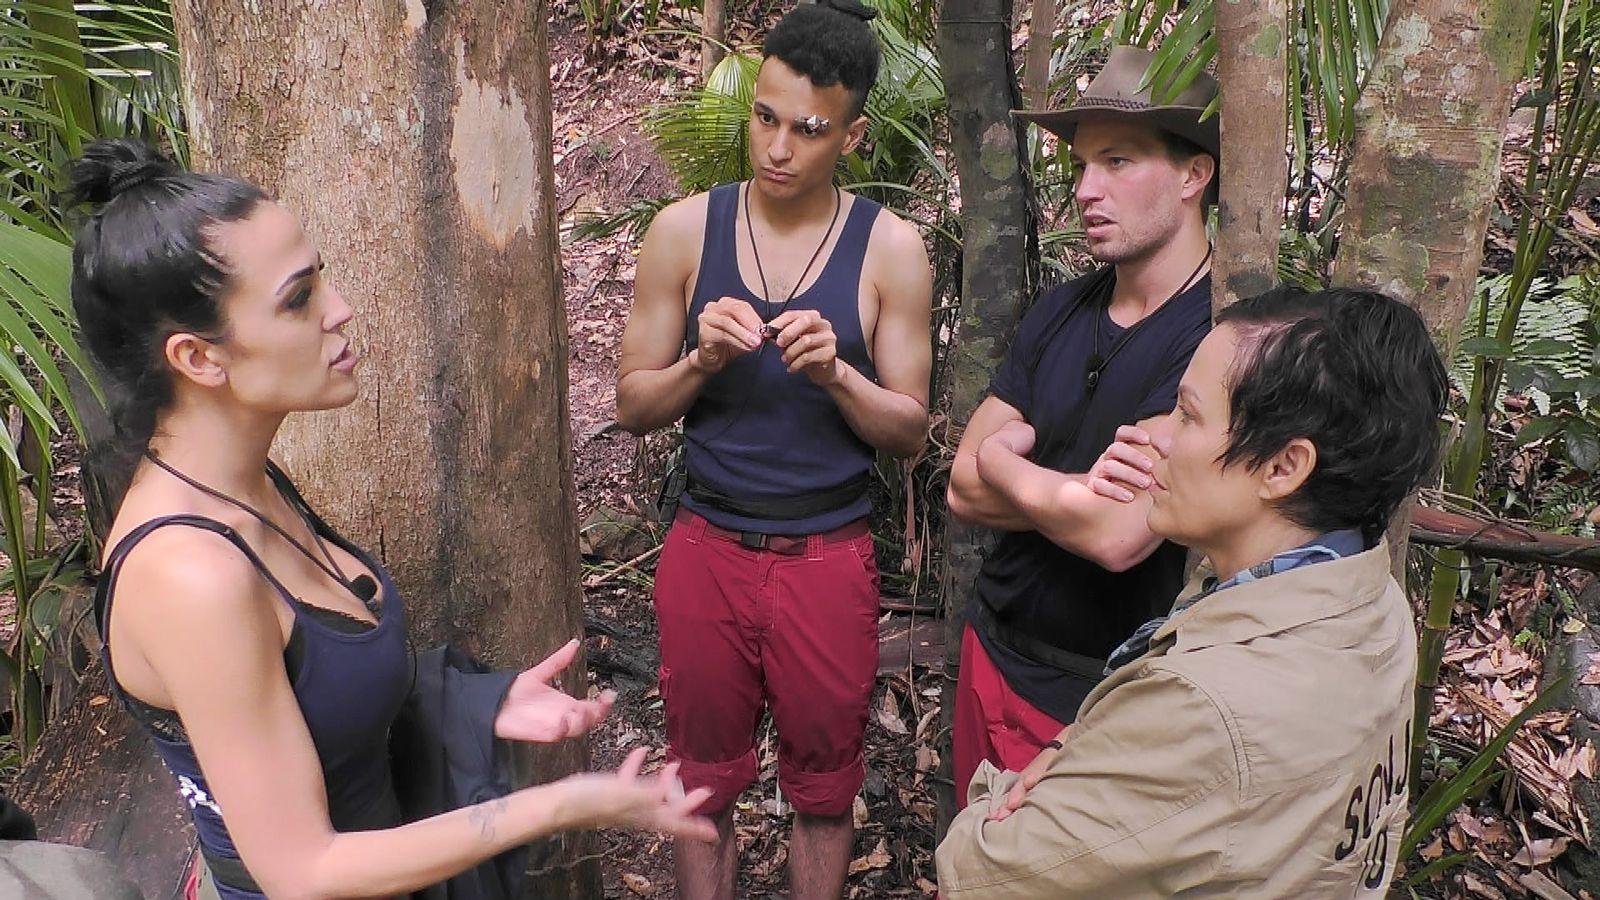 Dschungelcamp Tag 7